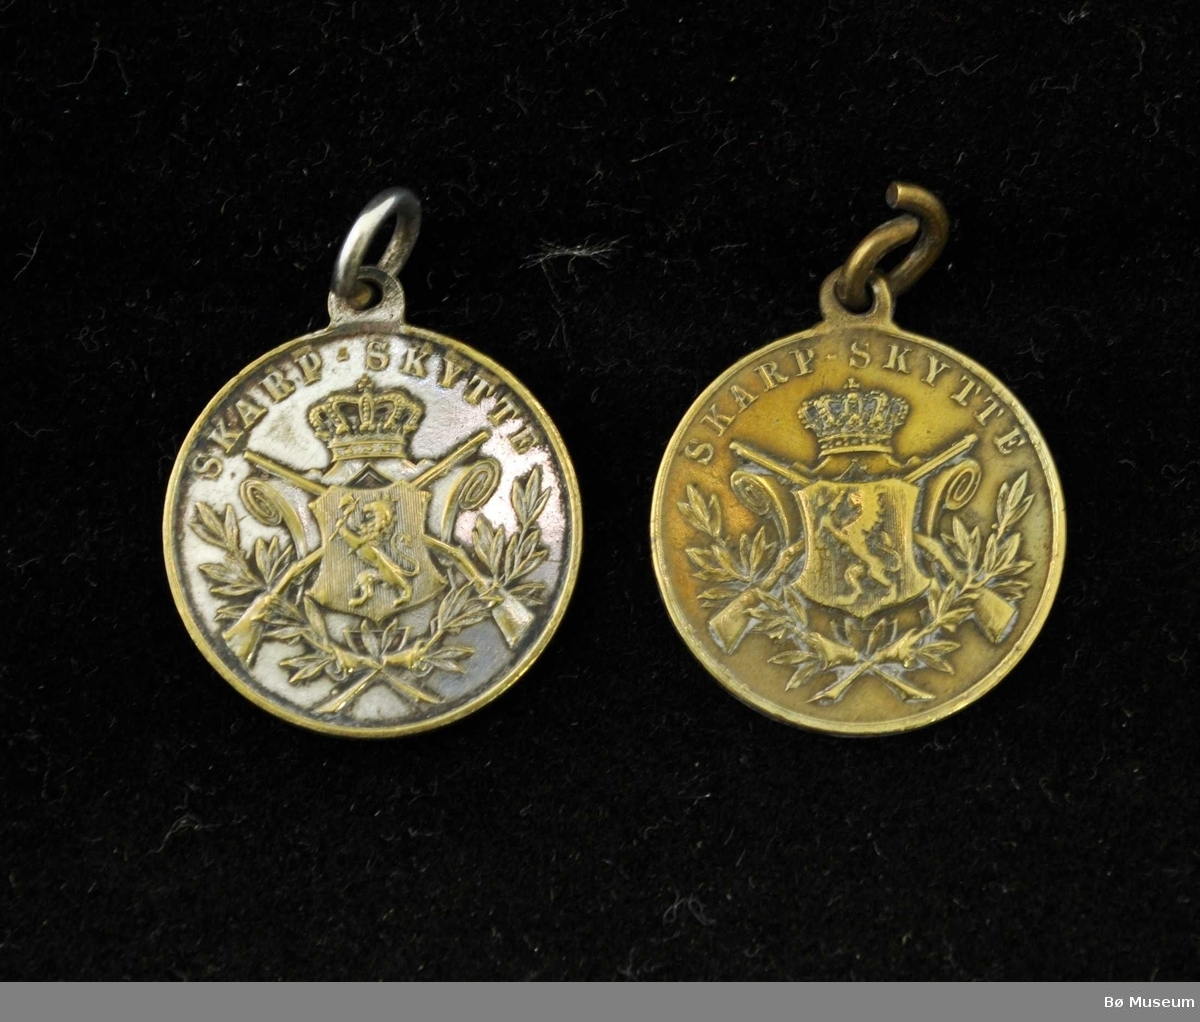 Sirkelformet medalje med løve, krone, korslagte gevær og grener på den ene siden, på den andre siden enkel kantbord. Samt 5 medaljenåler.